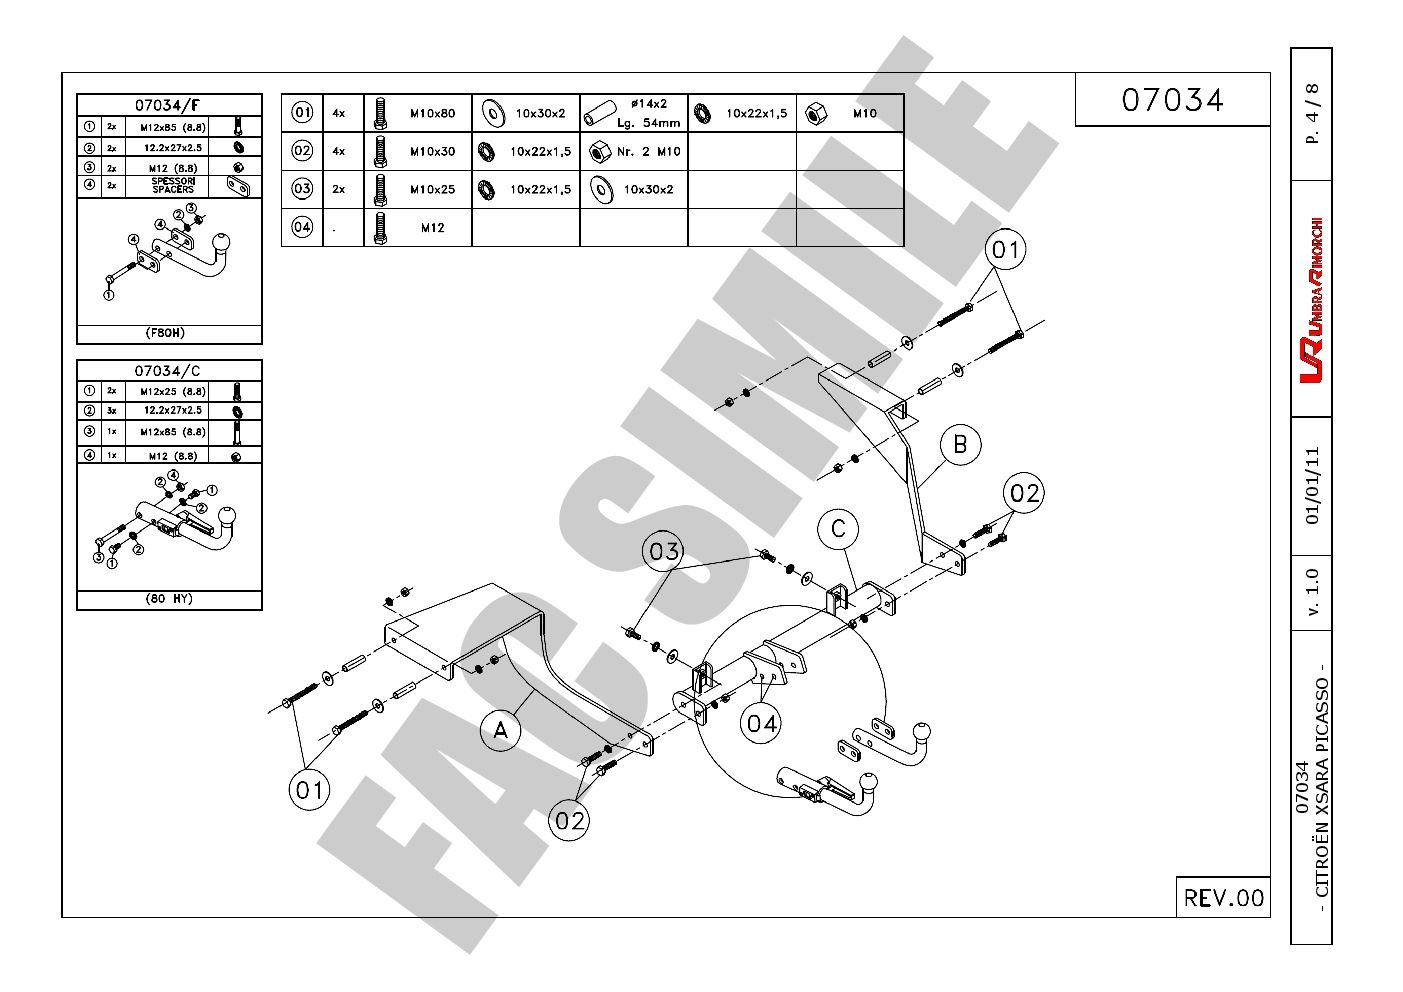 Wiring Diagram For Citroen Xsara Picasso Towbar Auto Electrical